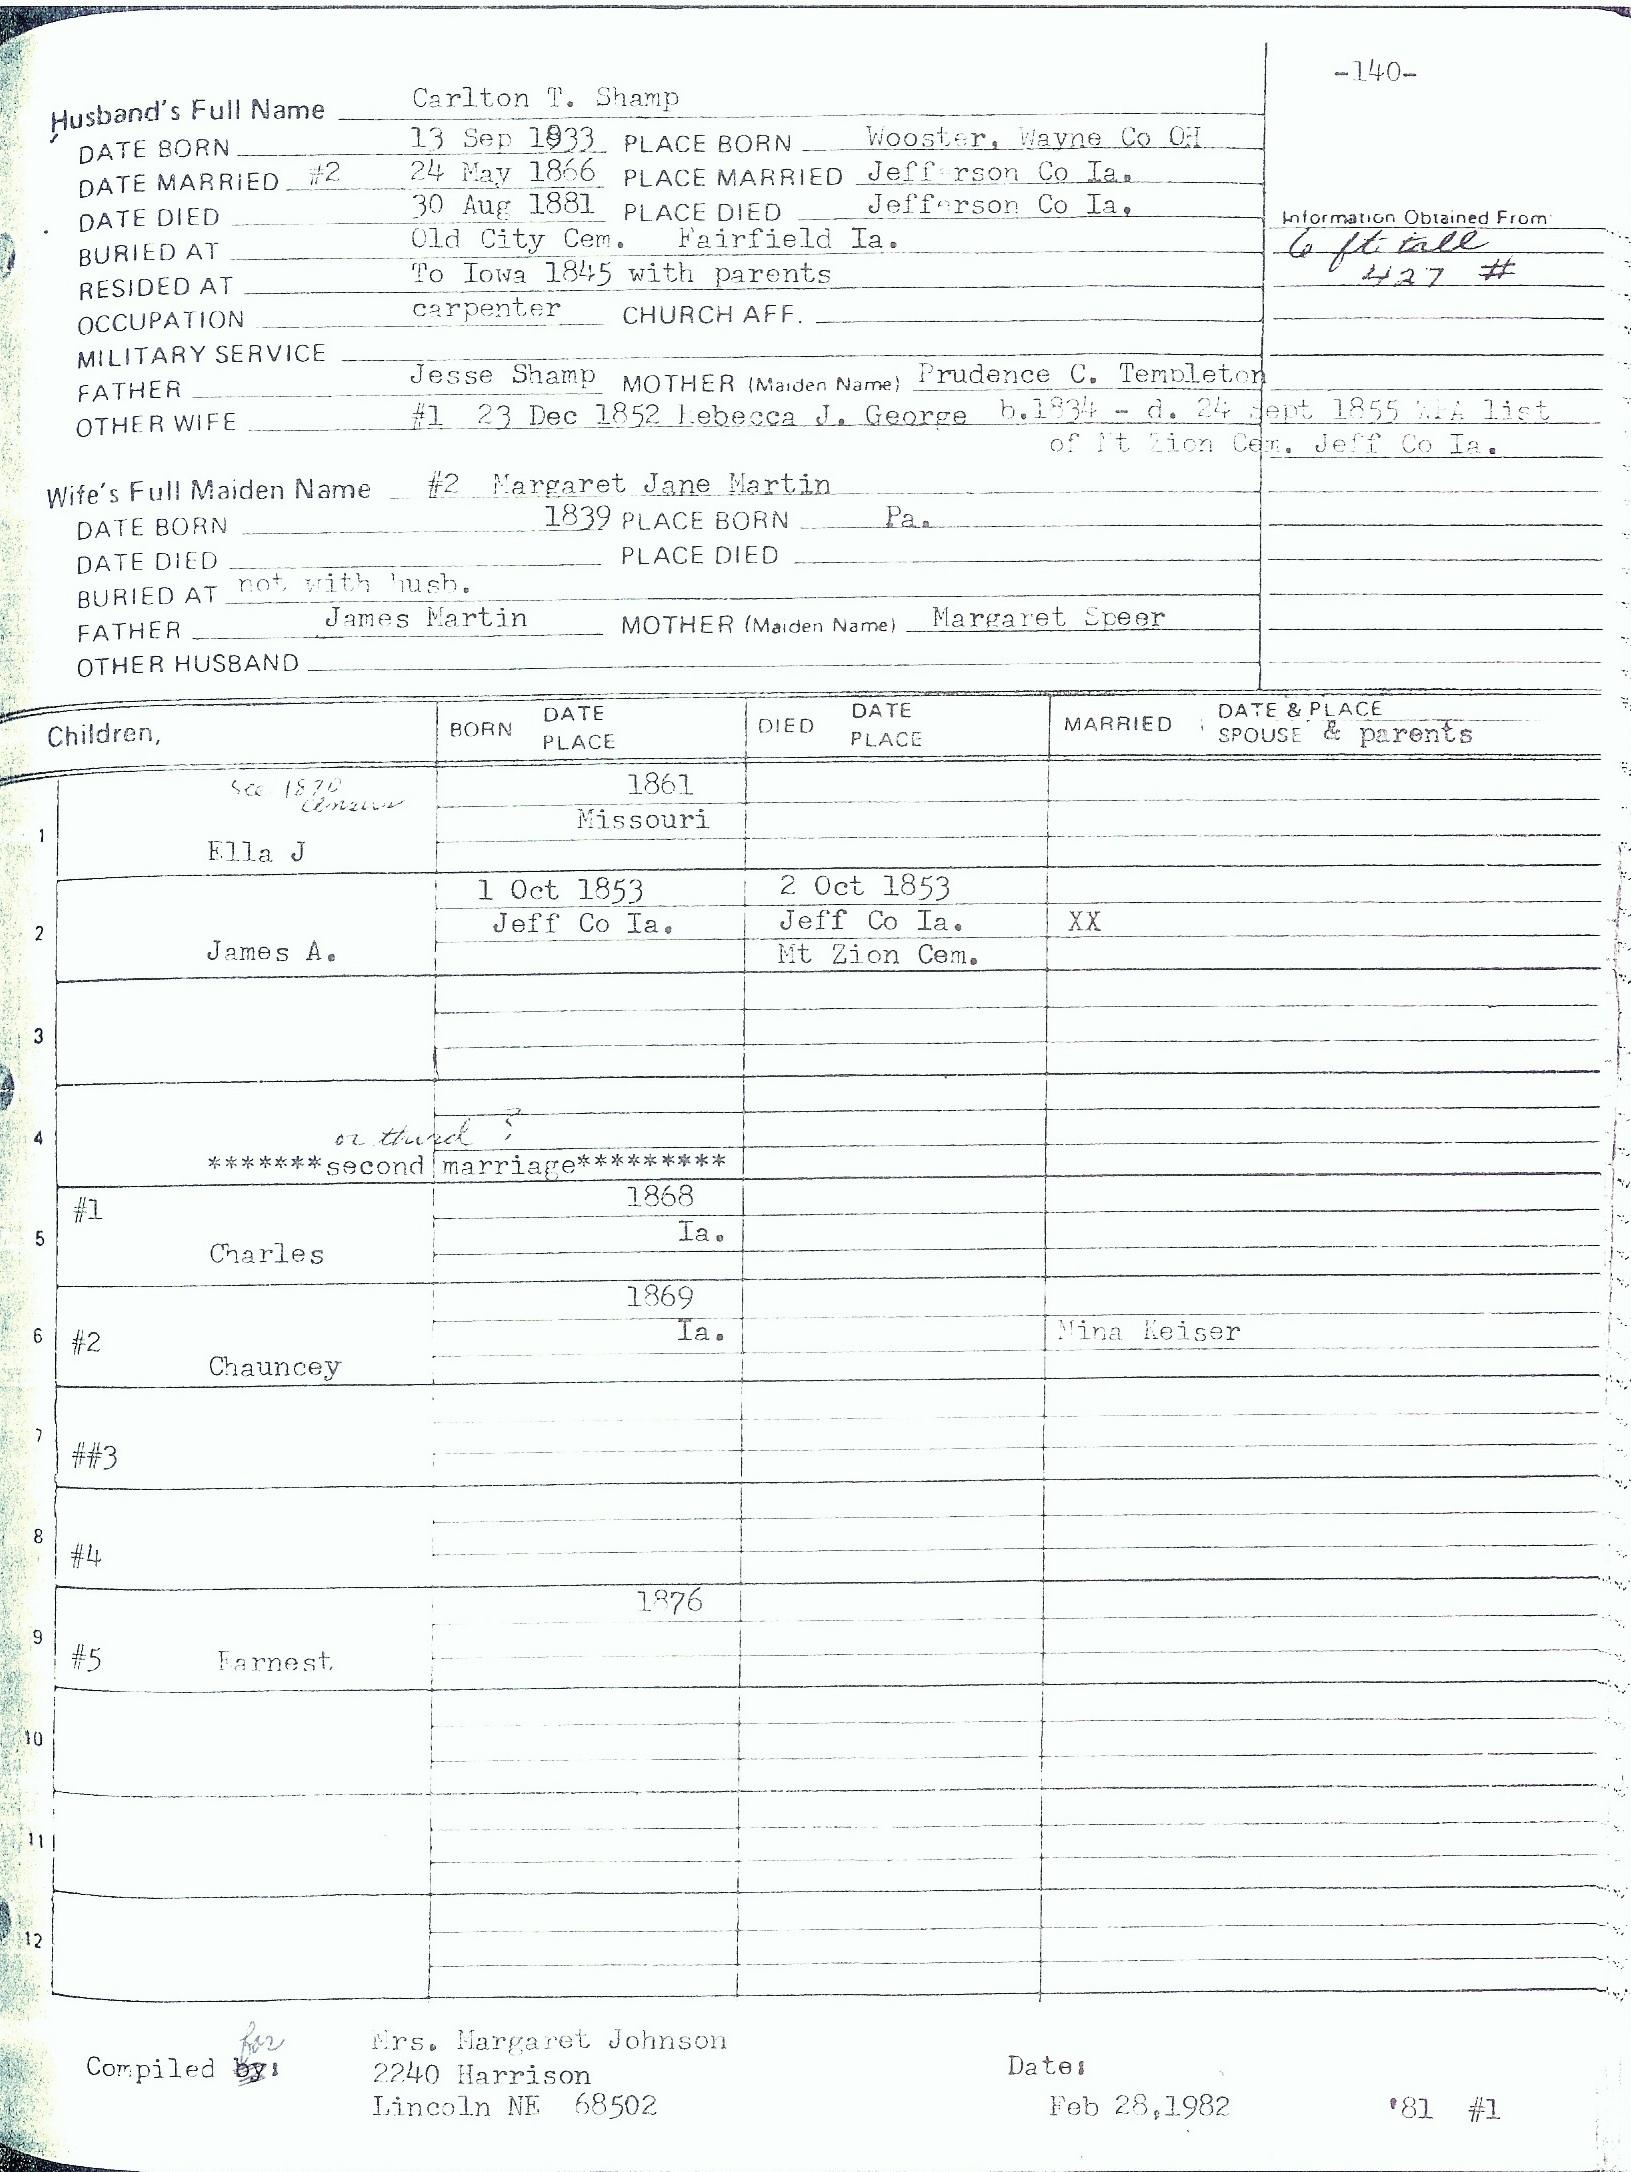 Genealogy Worksheet Free Worksheets Library – Genealogy Worksheets